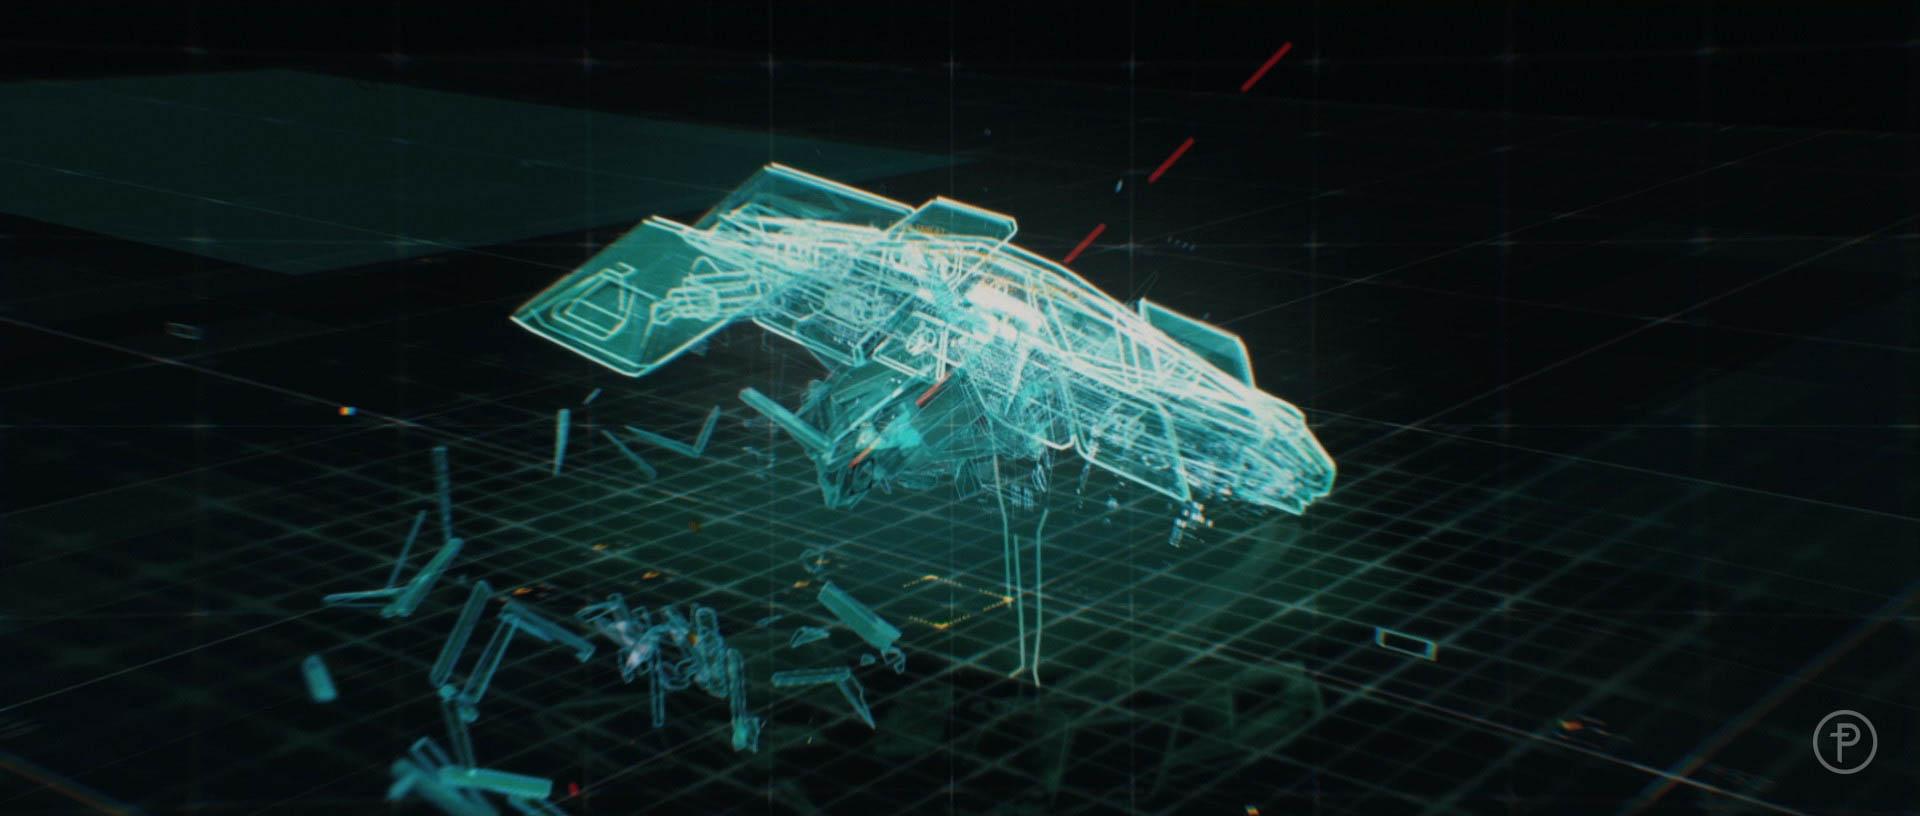 Zai_Ortiz_battleship_-16.jpg